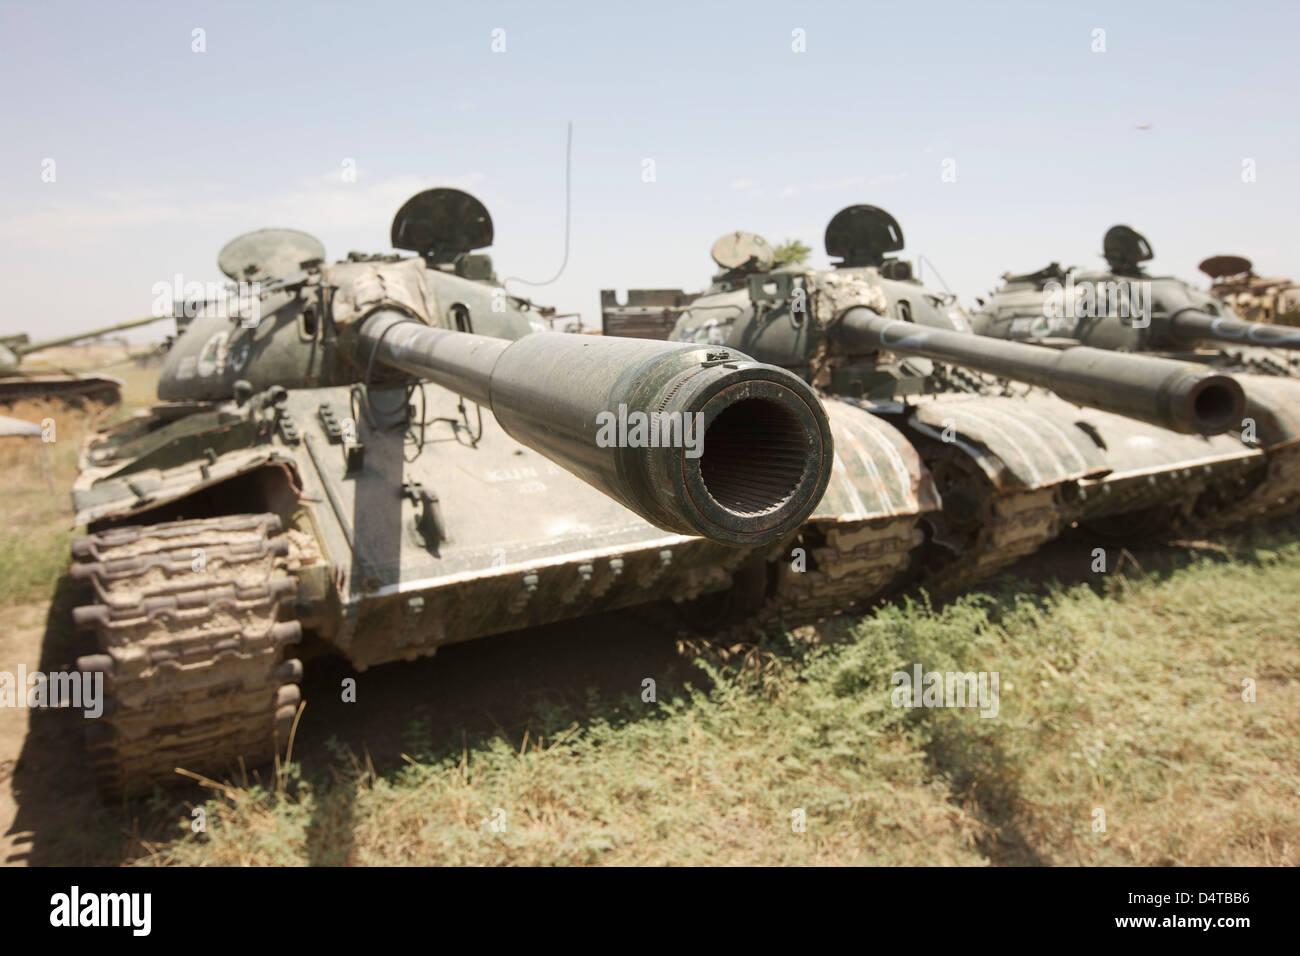 Russian T-54 and T-55 main battle tanks rest in an armor junkyard in Kunduz, Afghanistan. - Stock Image